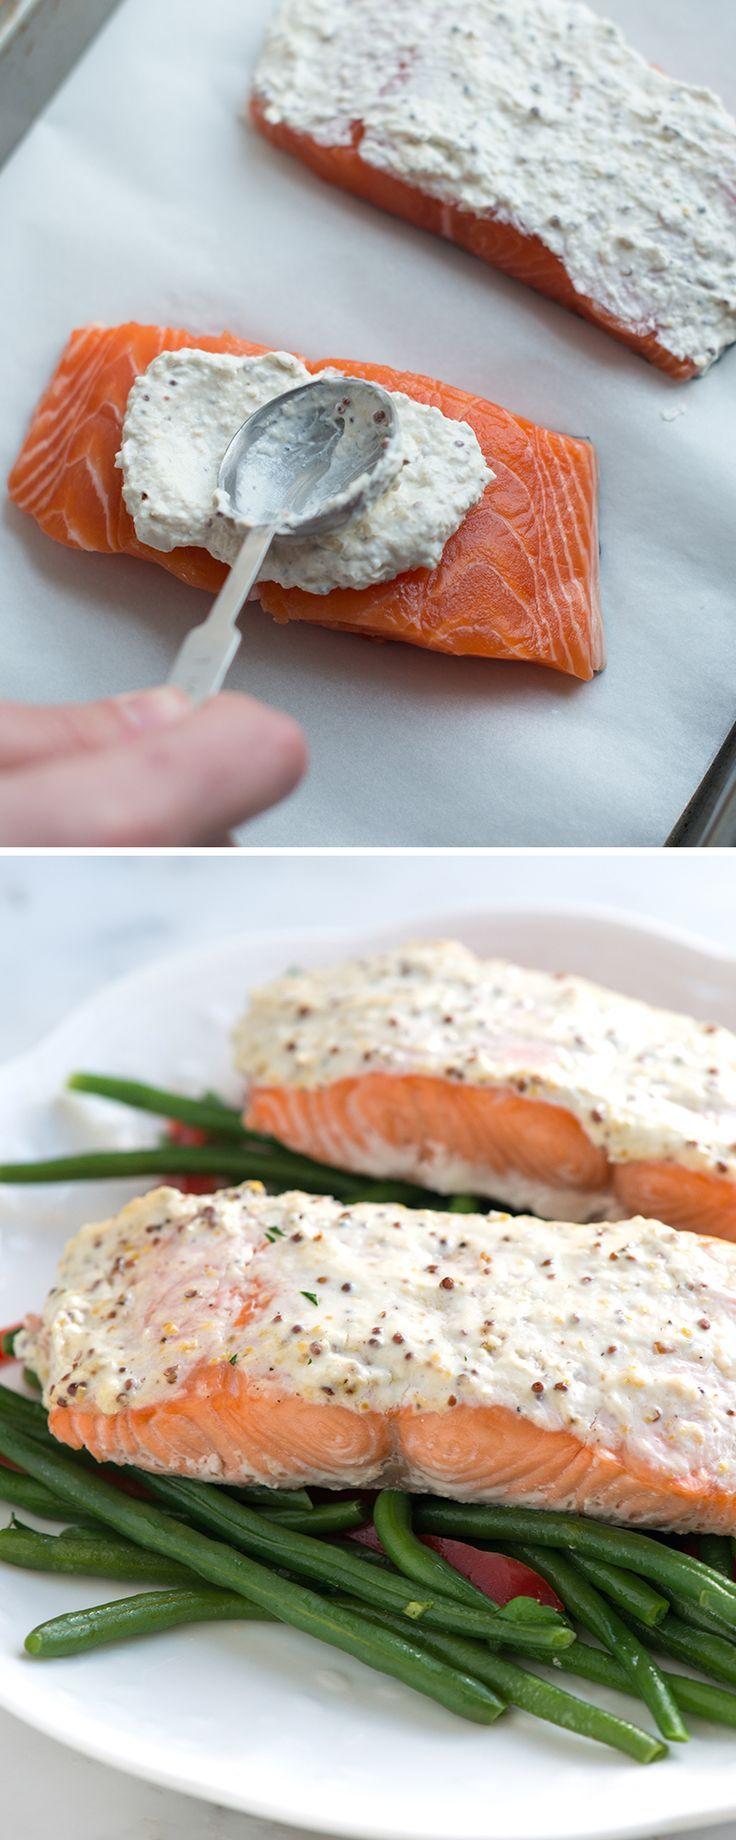 Easy Sour Cream Baked Salmon Recipe Baked Salmon Recipes Salmon Recipes Salmon Dishes